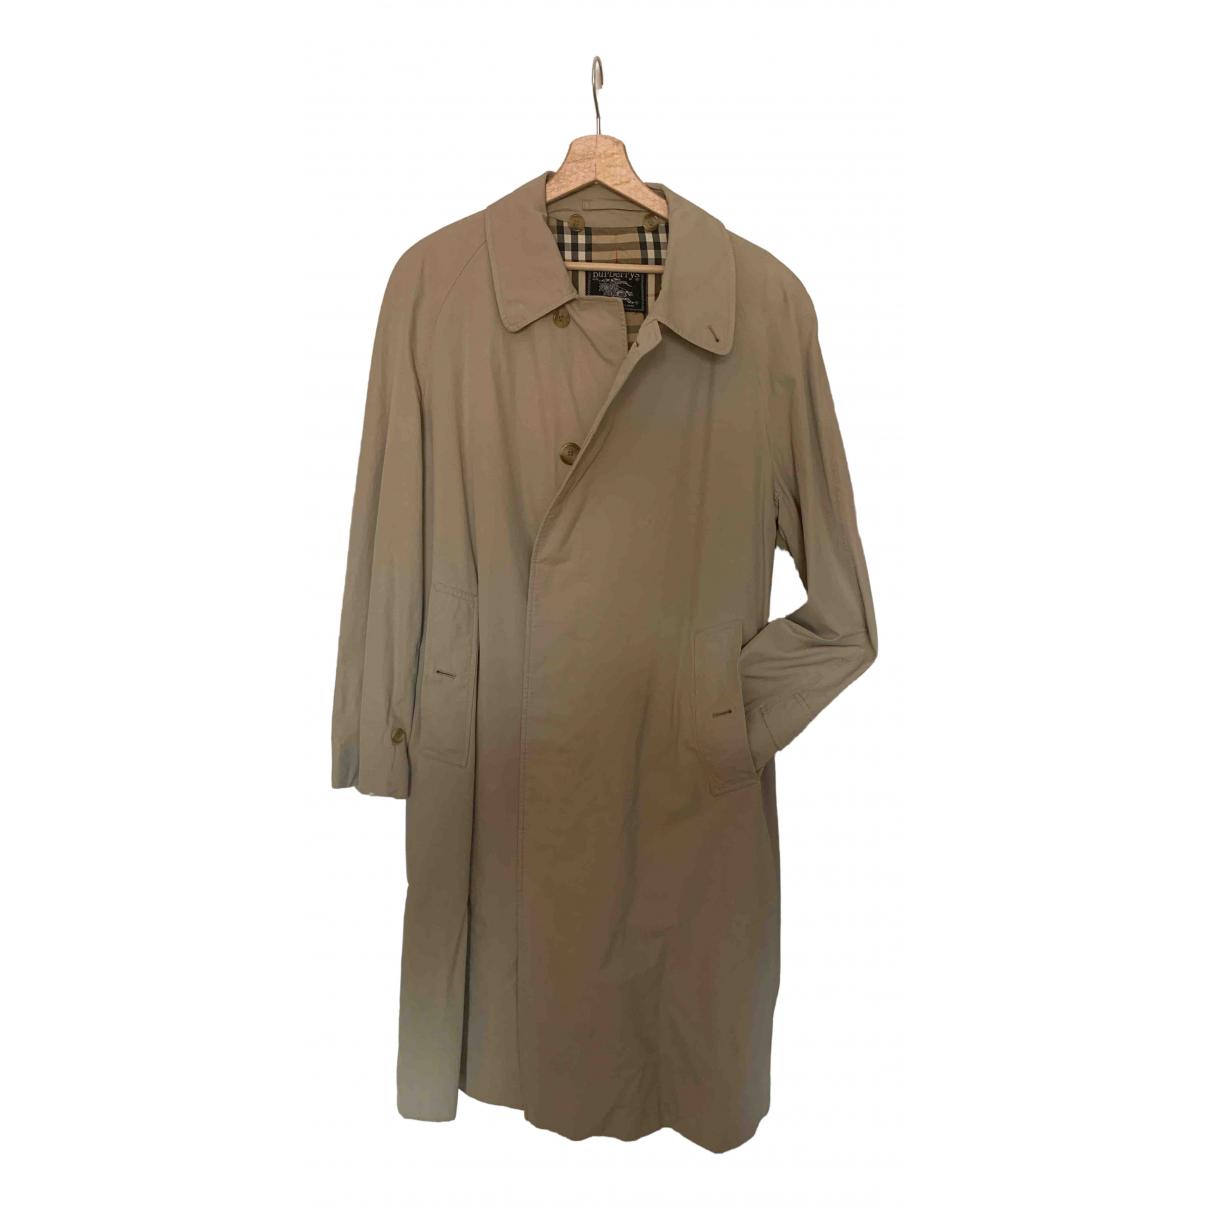 Burberry \N Beige Cotton coat  for Men M International